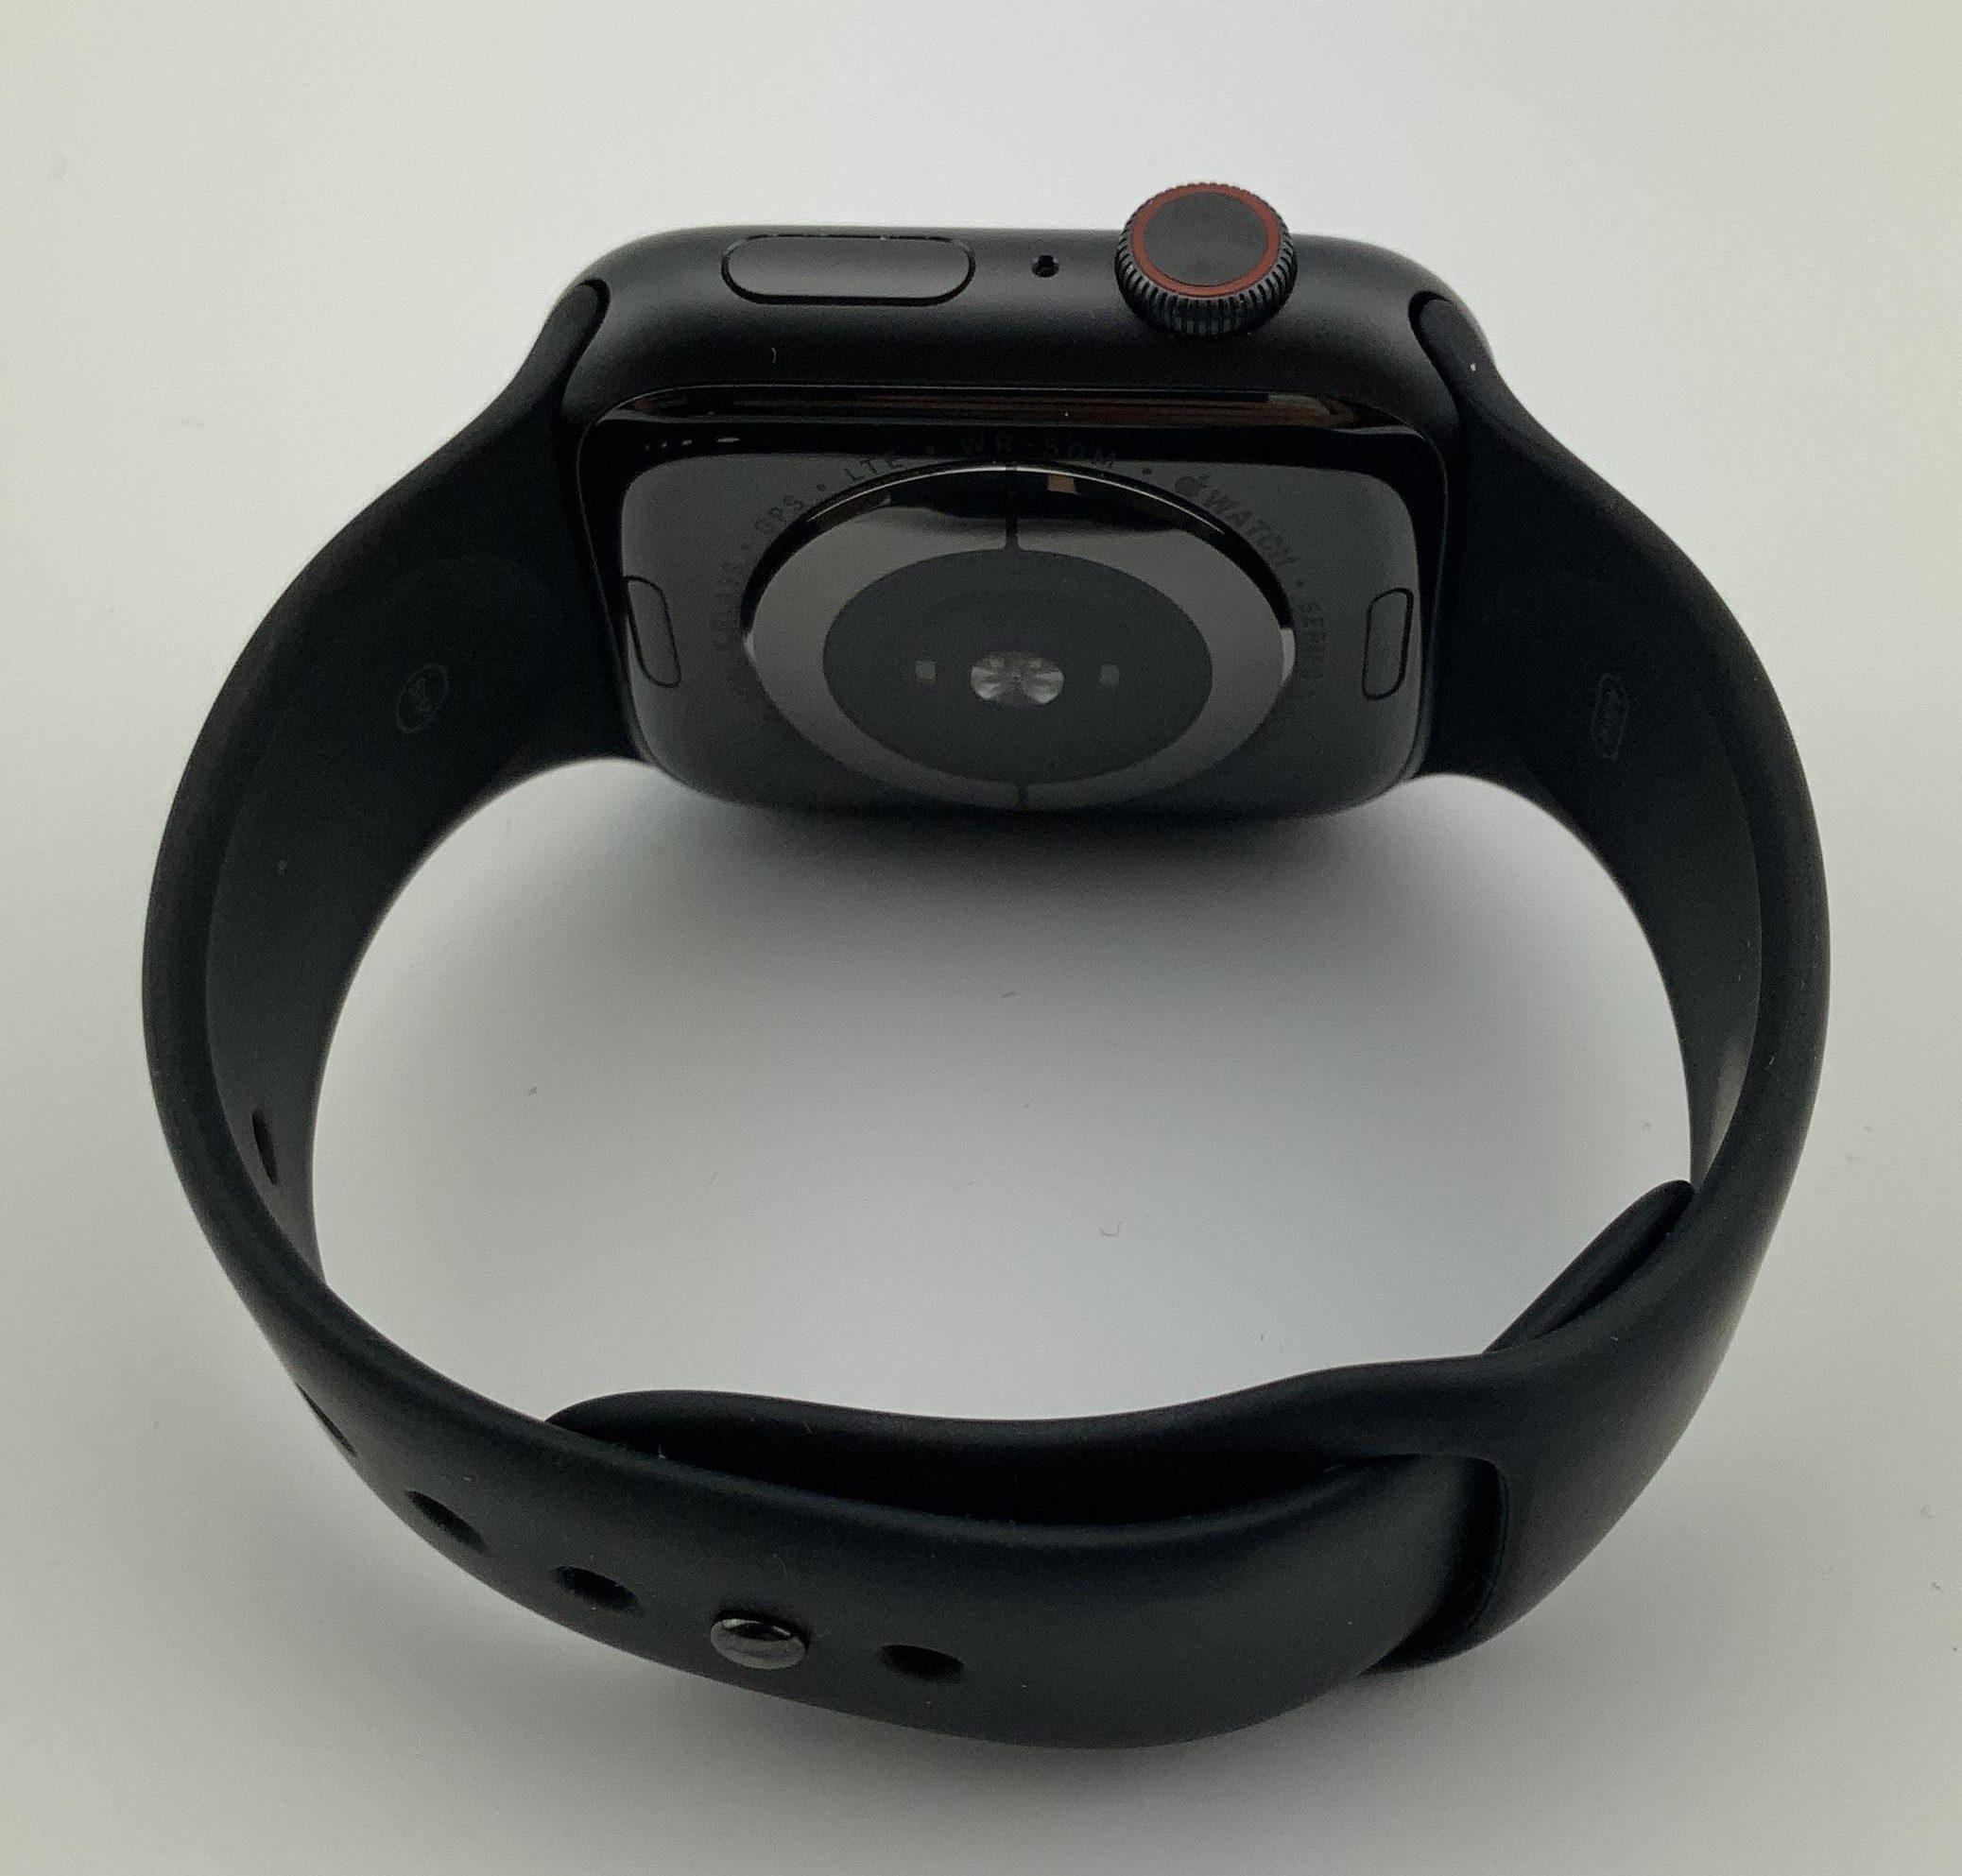 Watch Series 5 Aluminum Cellular (44mm), Space Gray, imagen 3